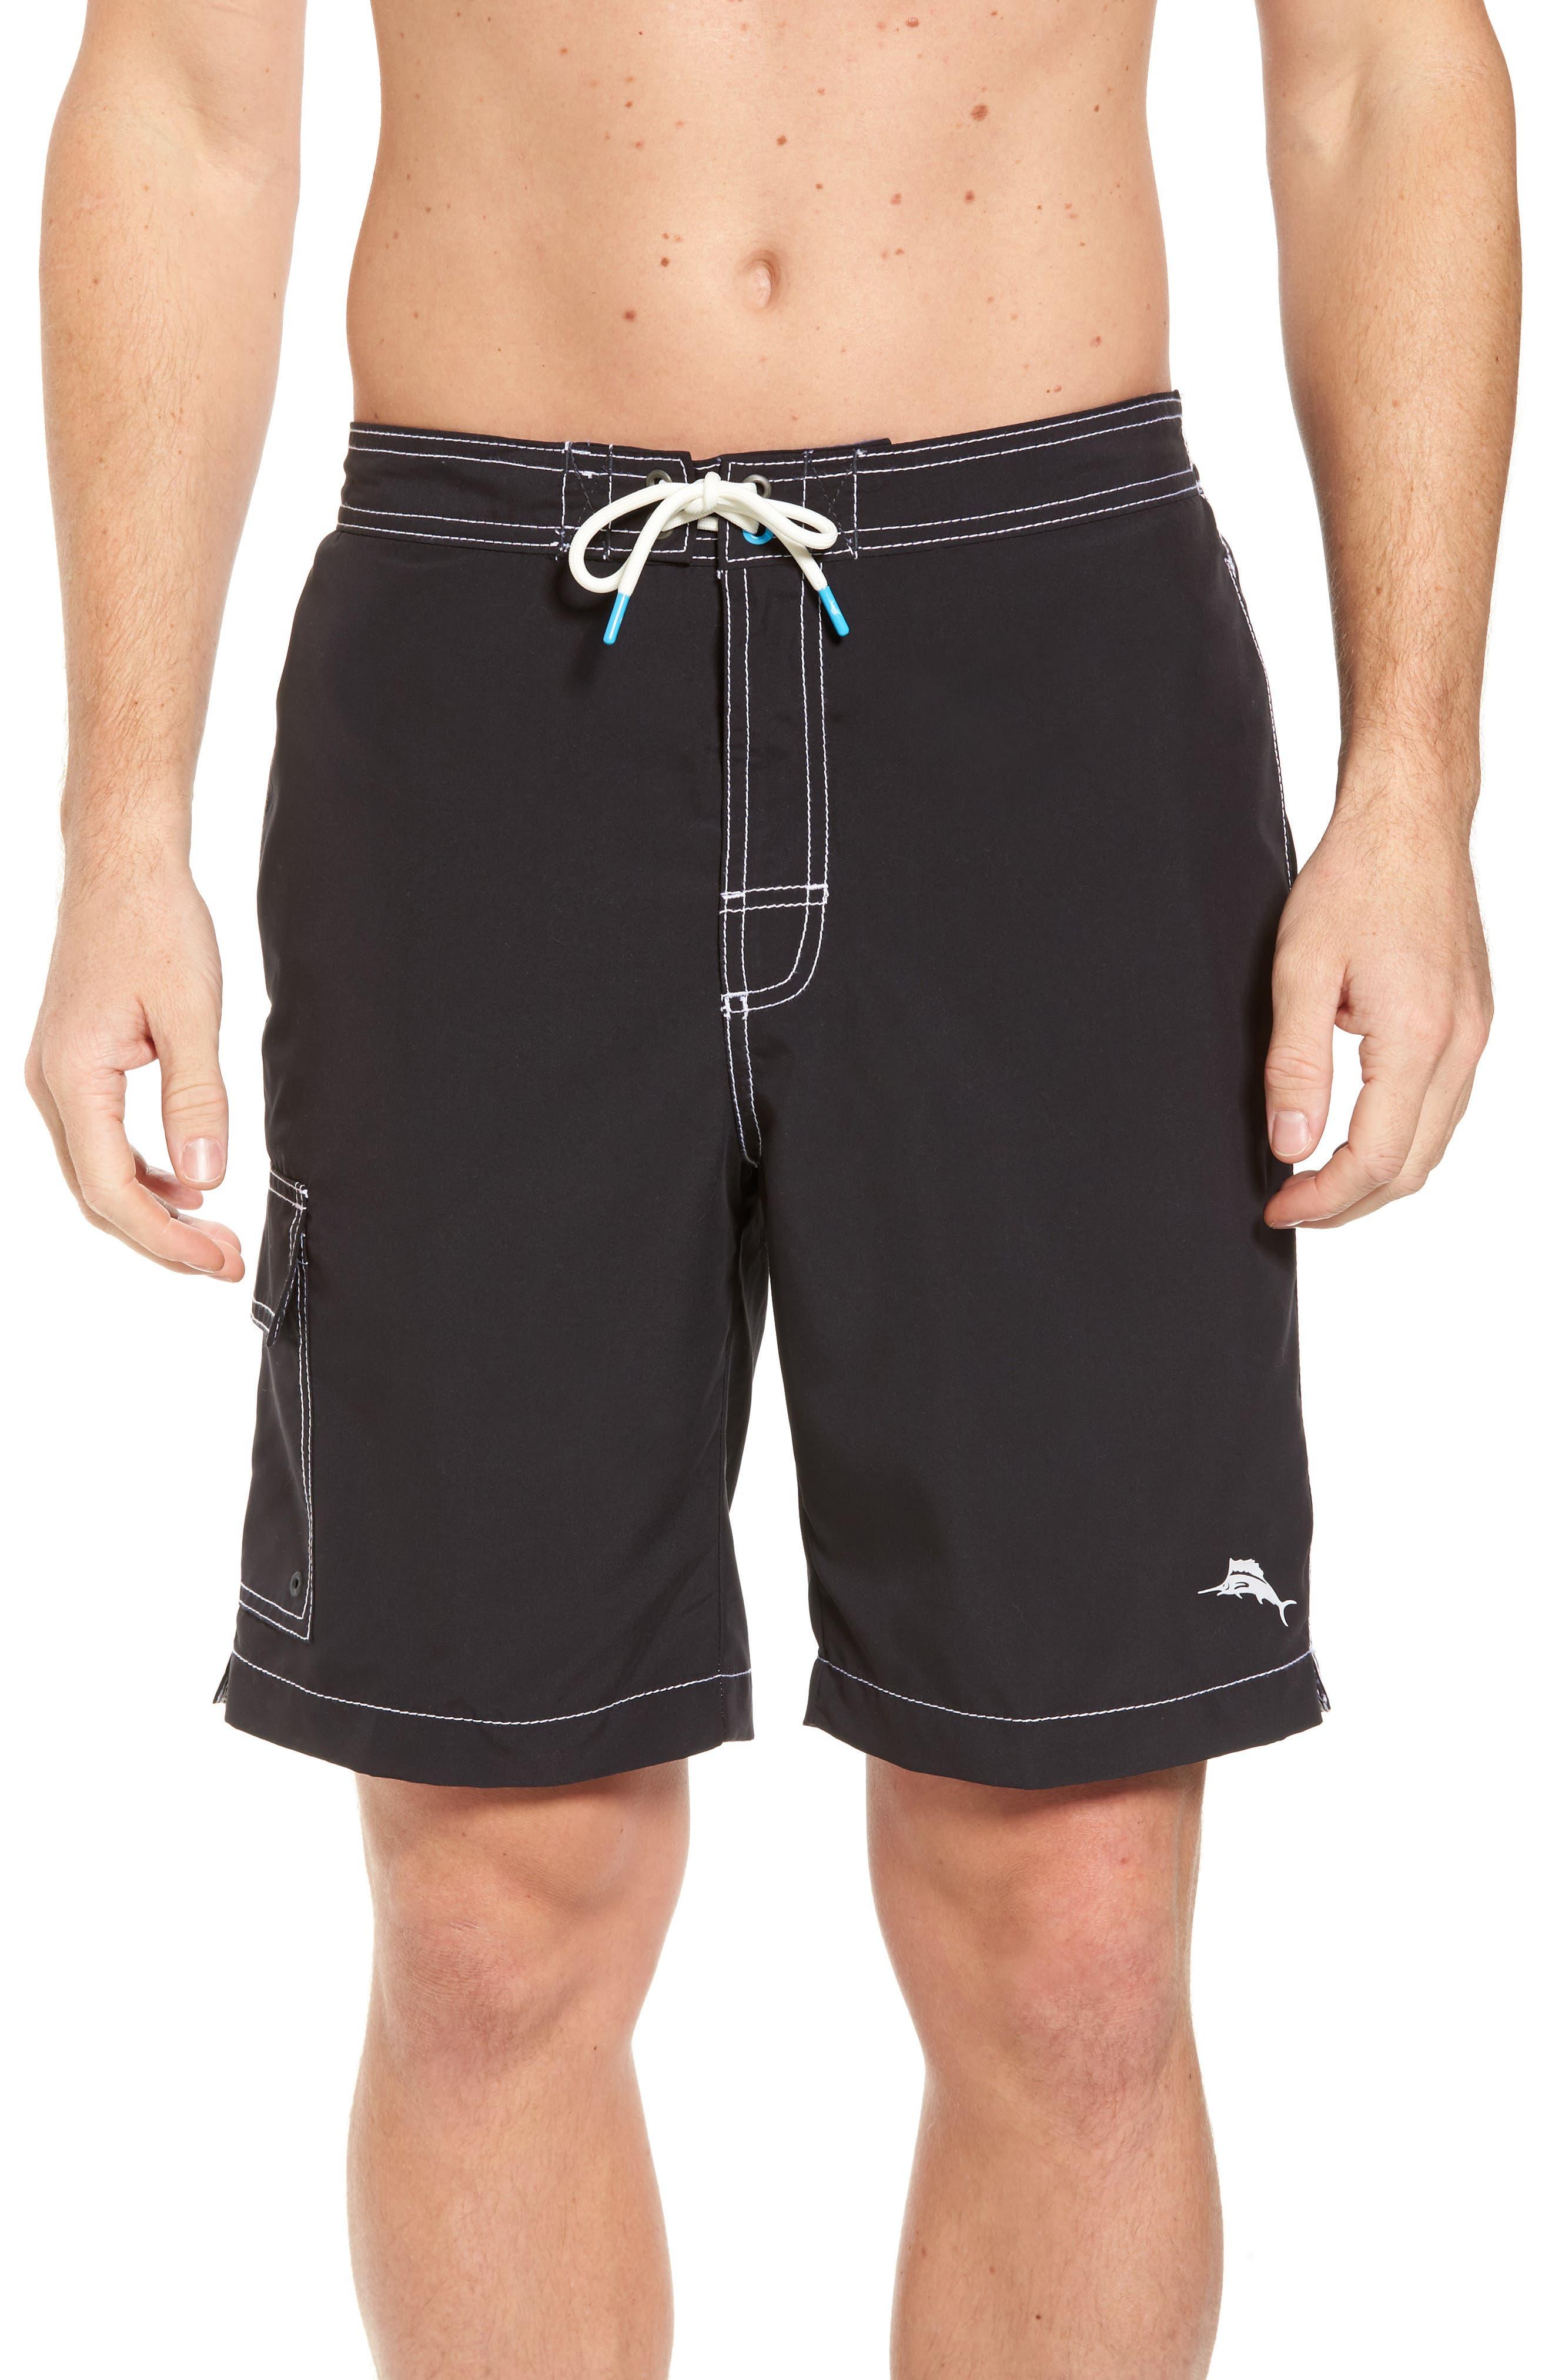 Baja Beach Board Shorts,                             Main thumbnail 1, color,                             BLACK